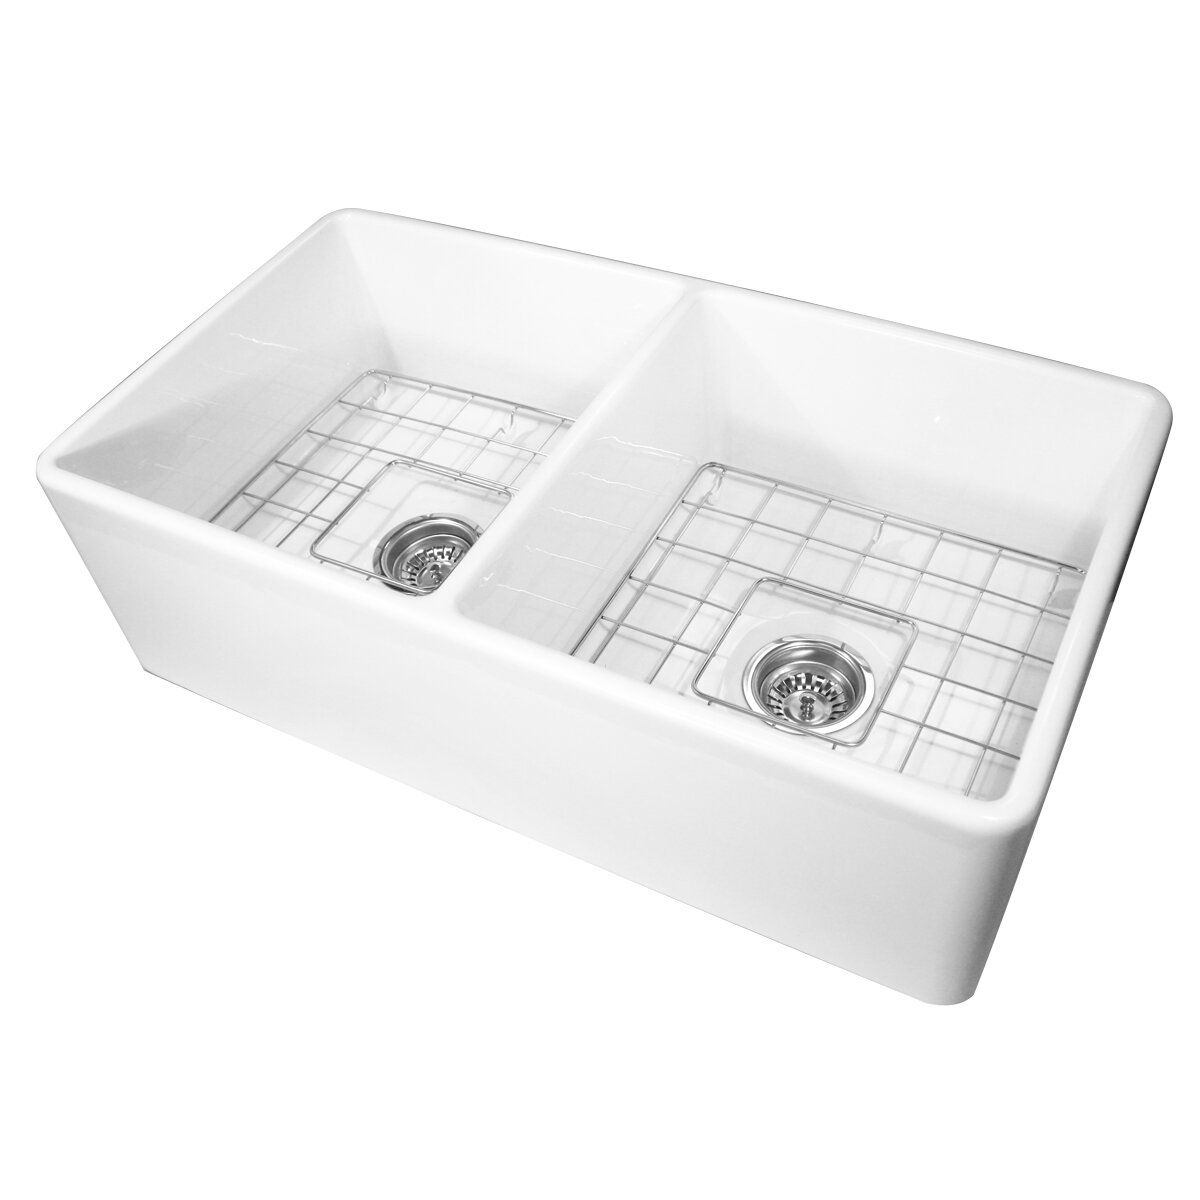 nantucket sinks cape 33 x 18 double bowl kitchen sink with grids reviews wayfair. Black Bedroom Furniture Sets. Home Design Ideas